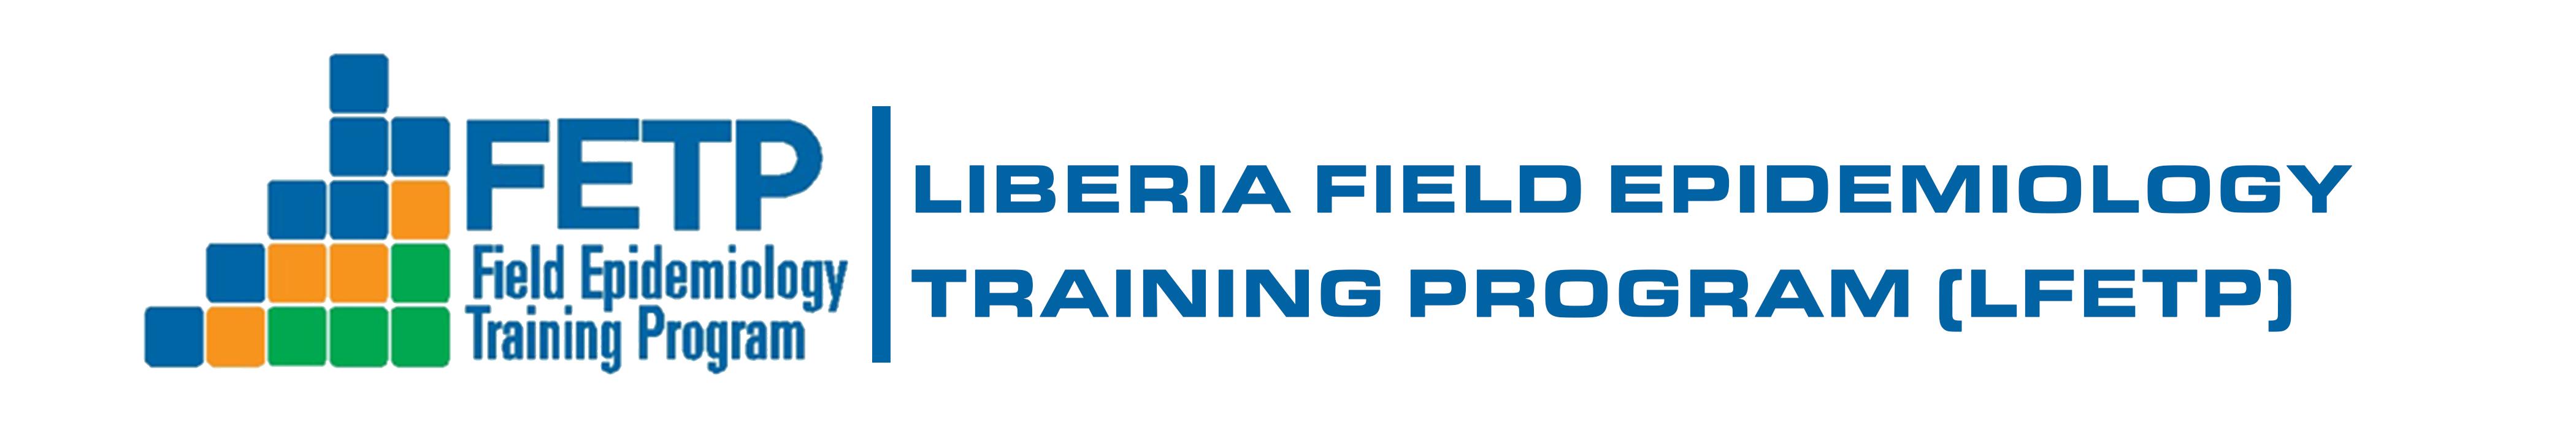 logo FETP